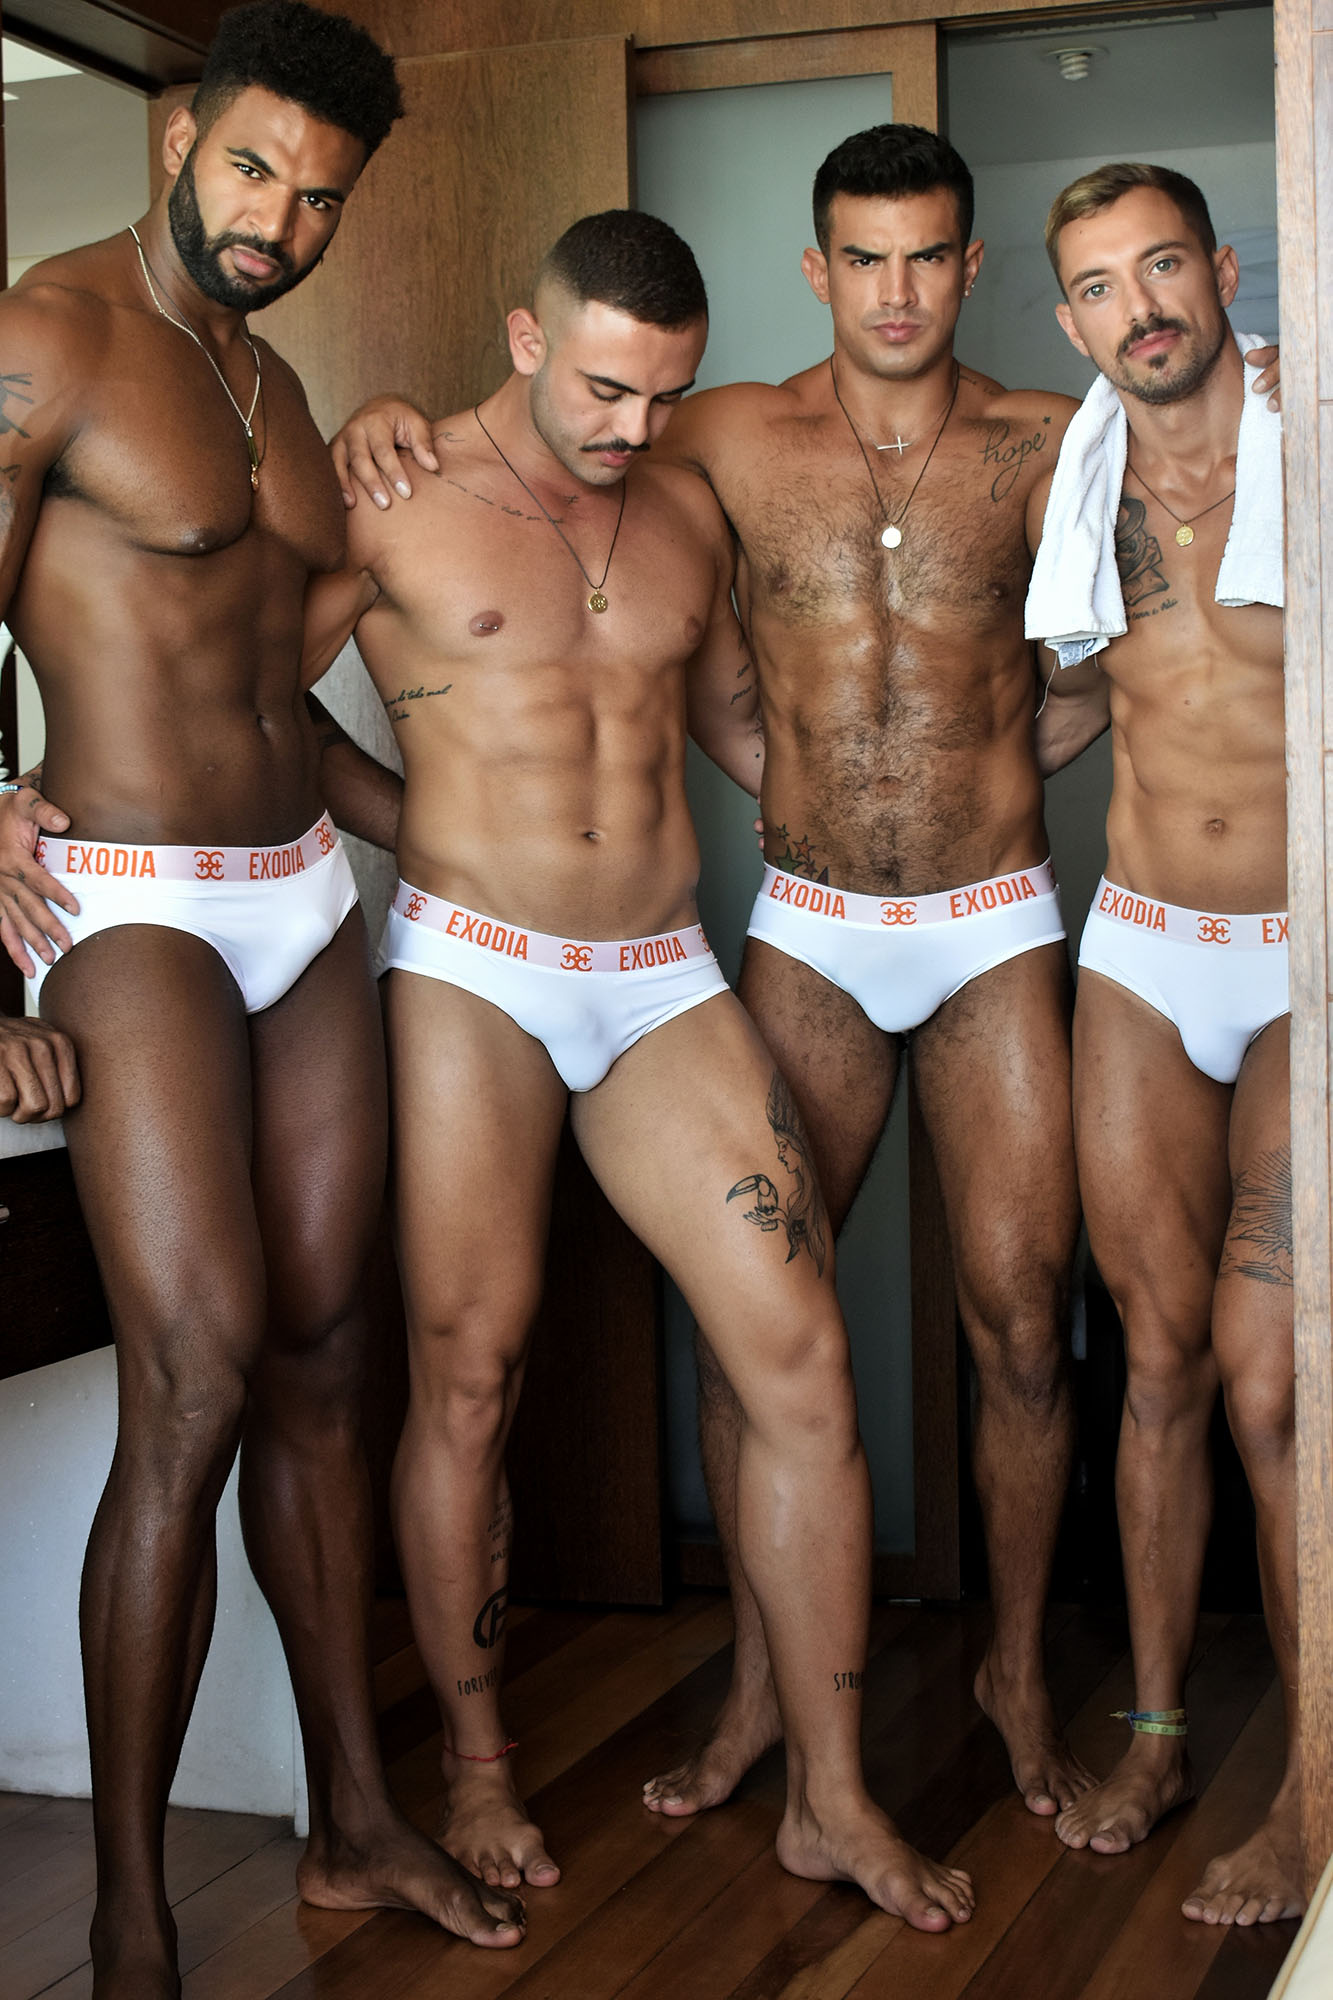 Exodia underwear - modelsJuanFer De La Torre, William Santos, Gian Bastos and Thomas Cerrini